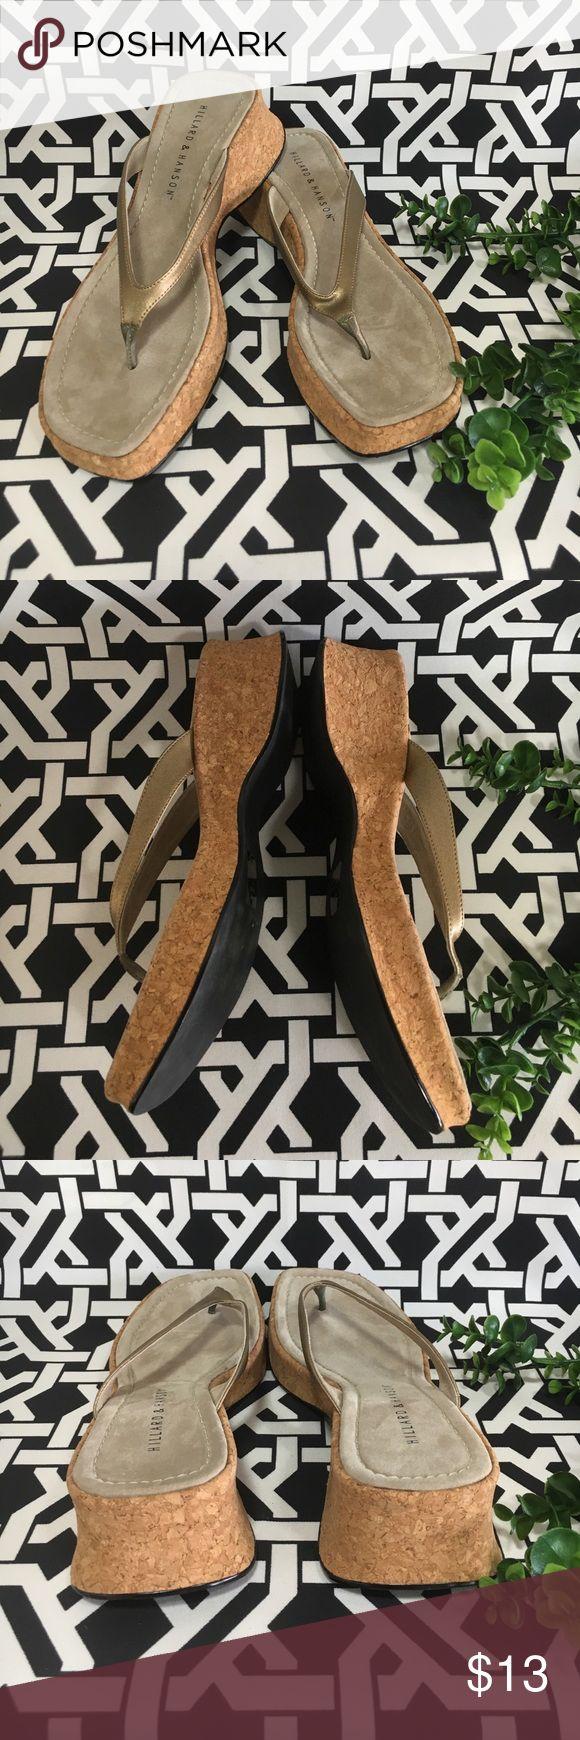 Hillard & Hanson Lemon Thong Cork Sandals SZ 10M Hillard & Hanson Lemon Thong Cork Sandals SZ 10M Display Sandals comes without box Hillard & Hanson Shoes Sandals